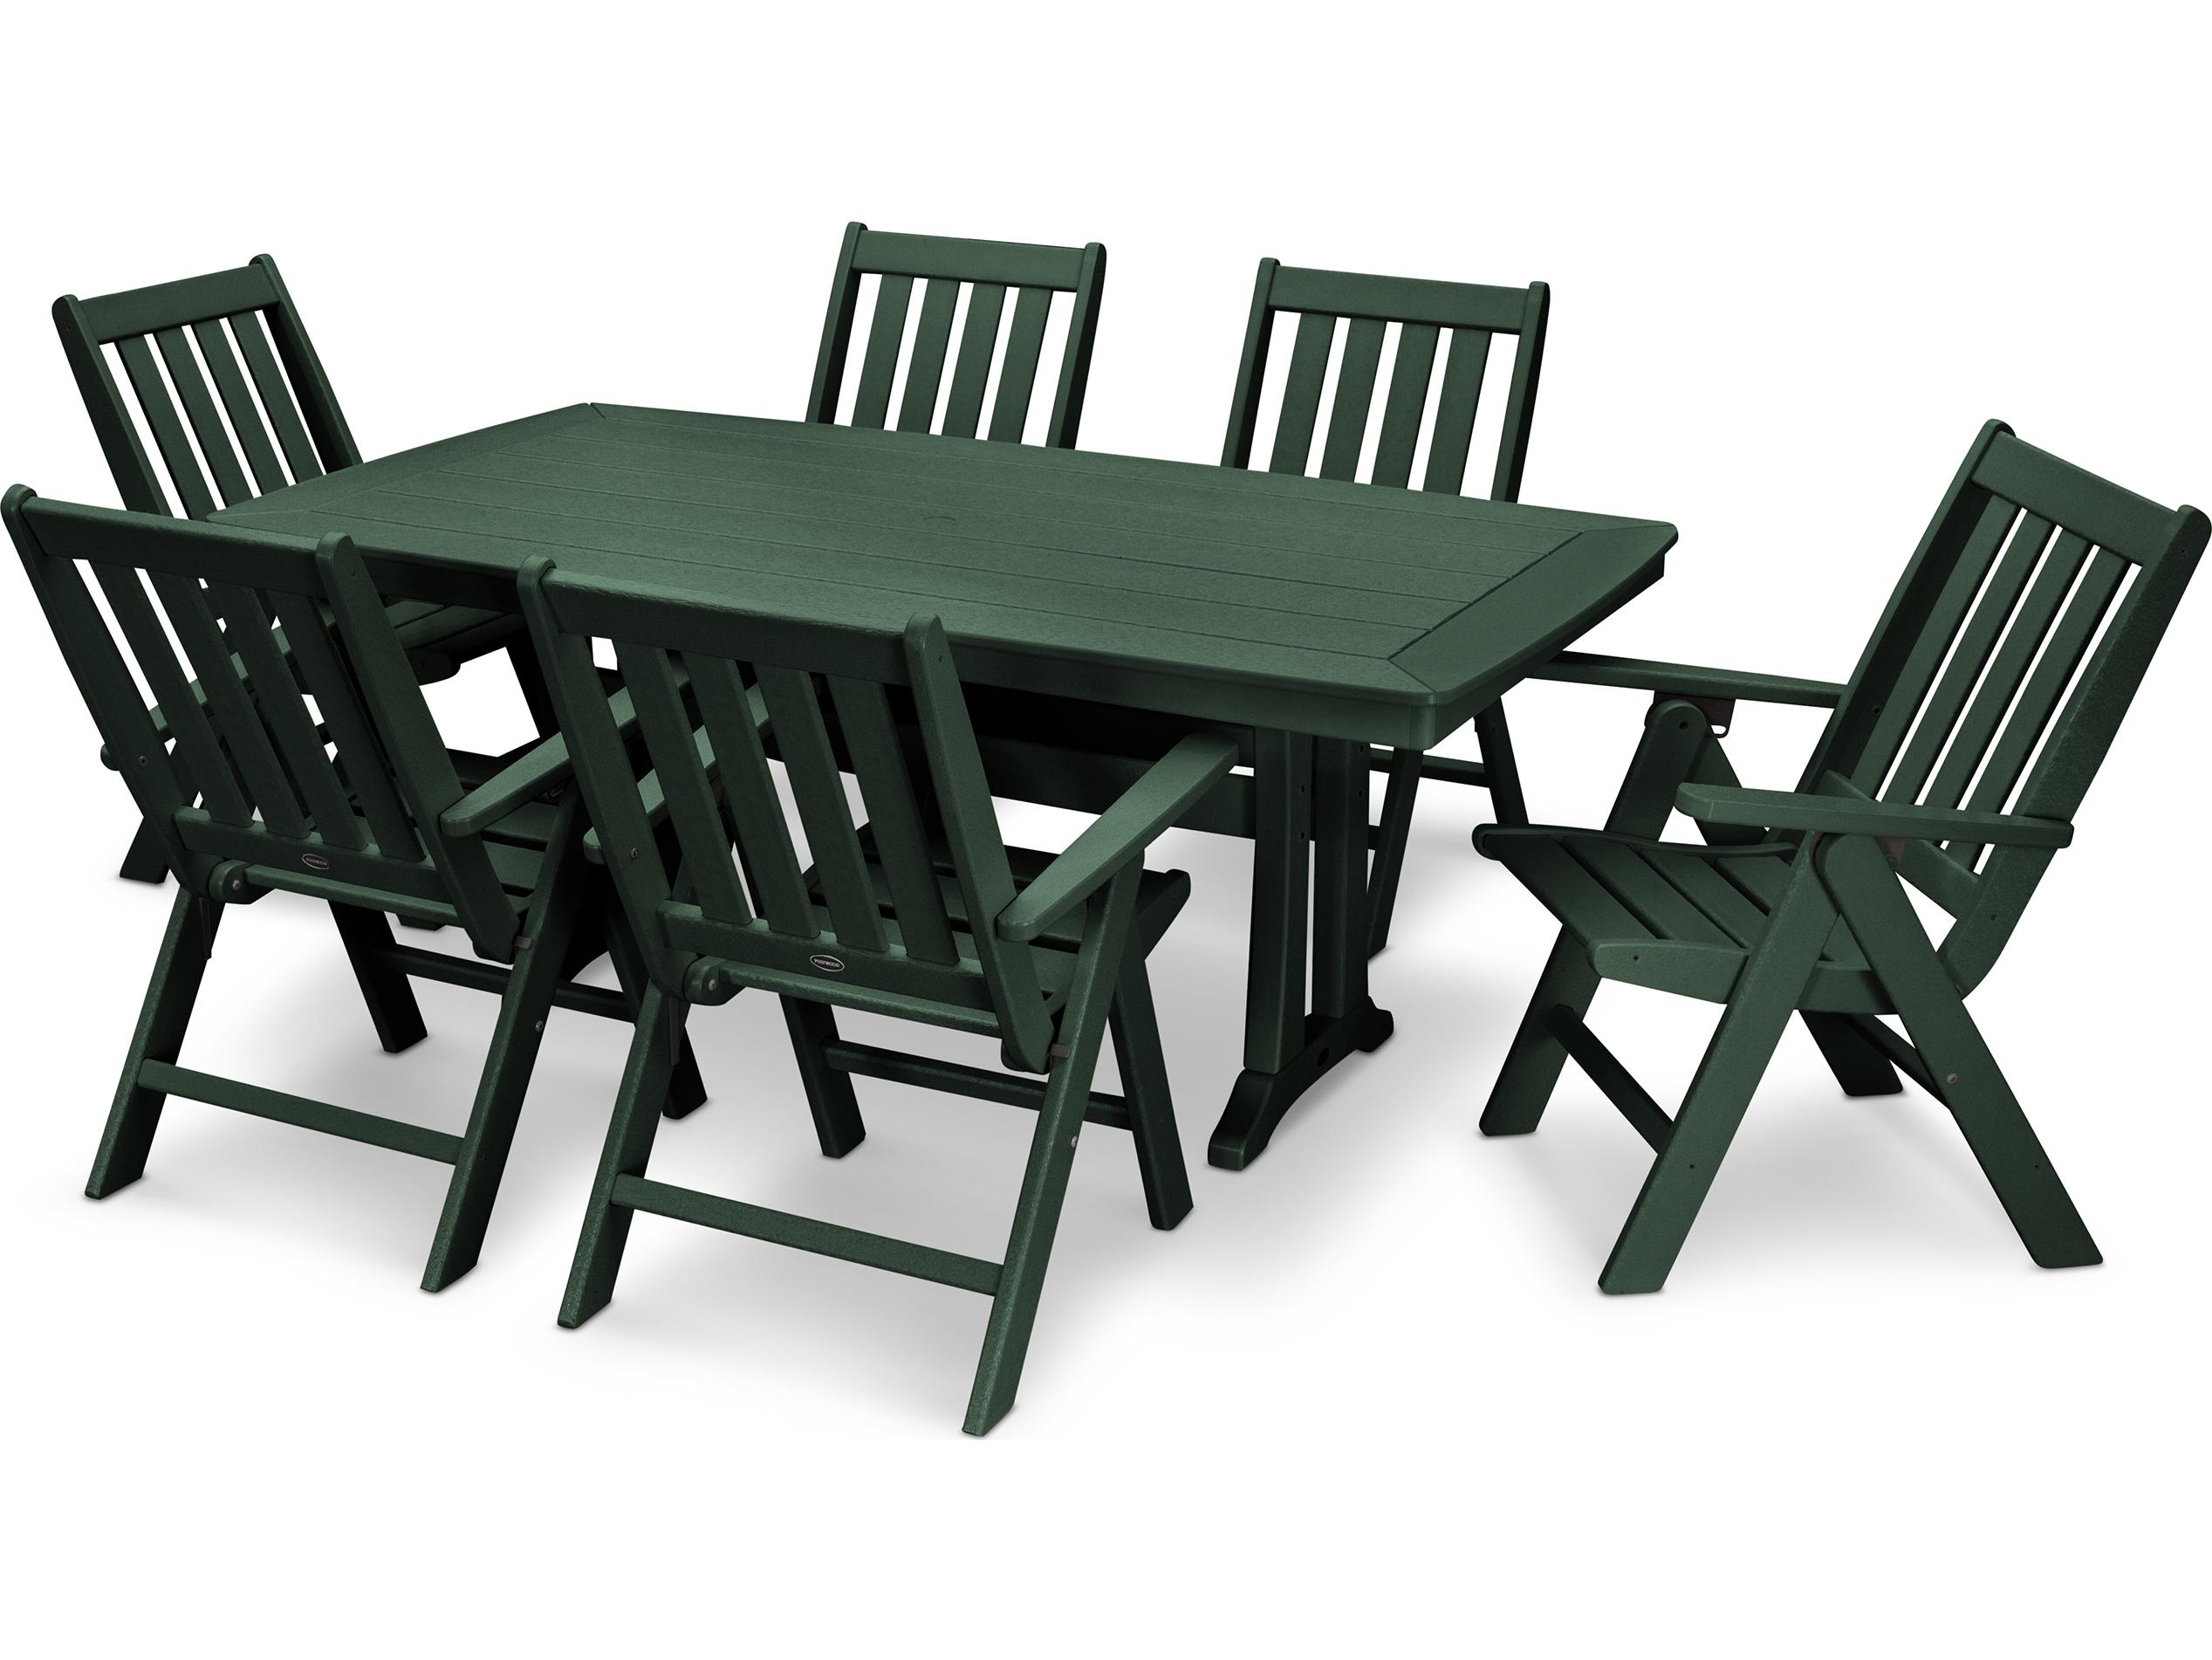 POLYWOOD® Vineyard Recycled Plastic Dining Set | PWS344 1